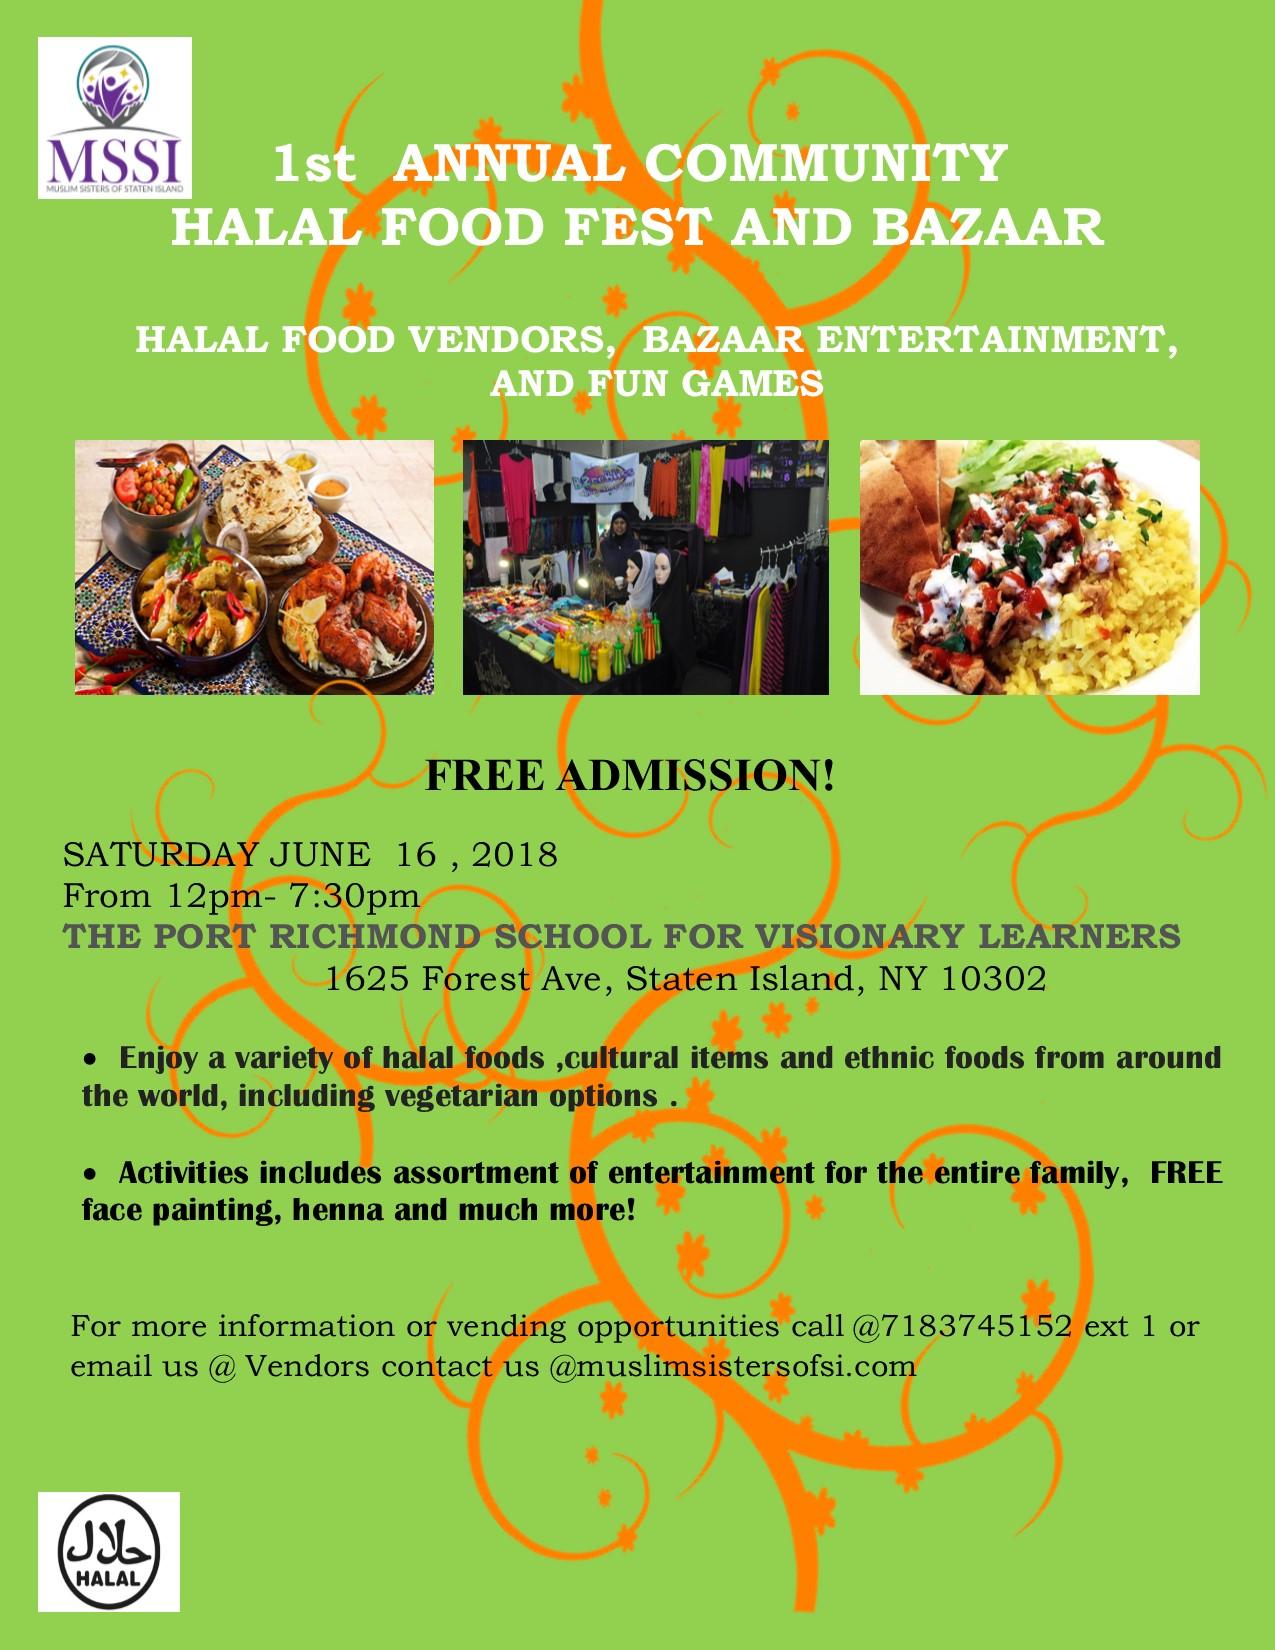 MSSI Annual Community Food Fest & Bazaar.jpg